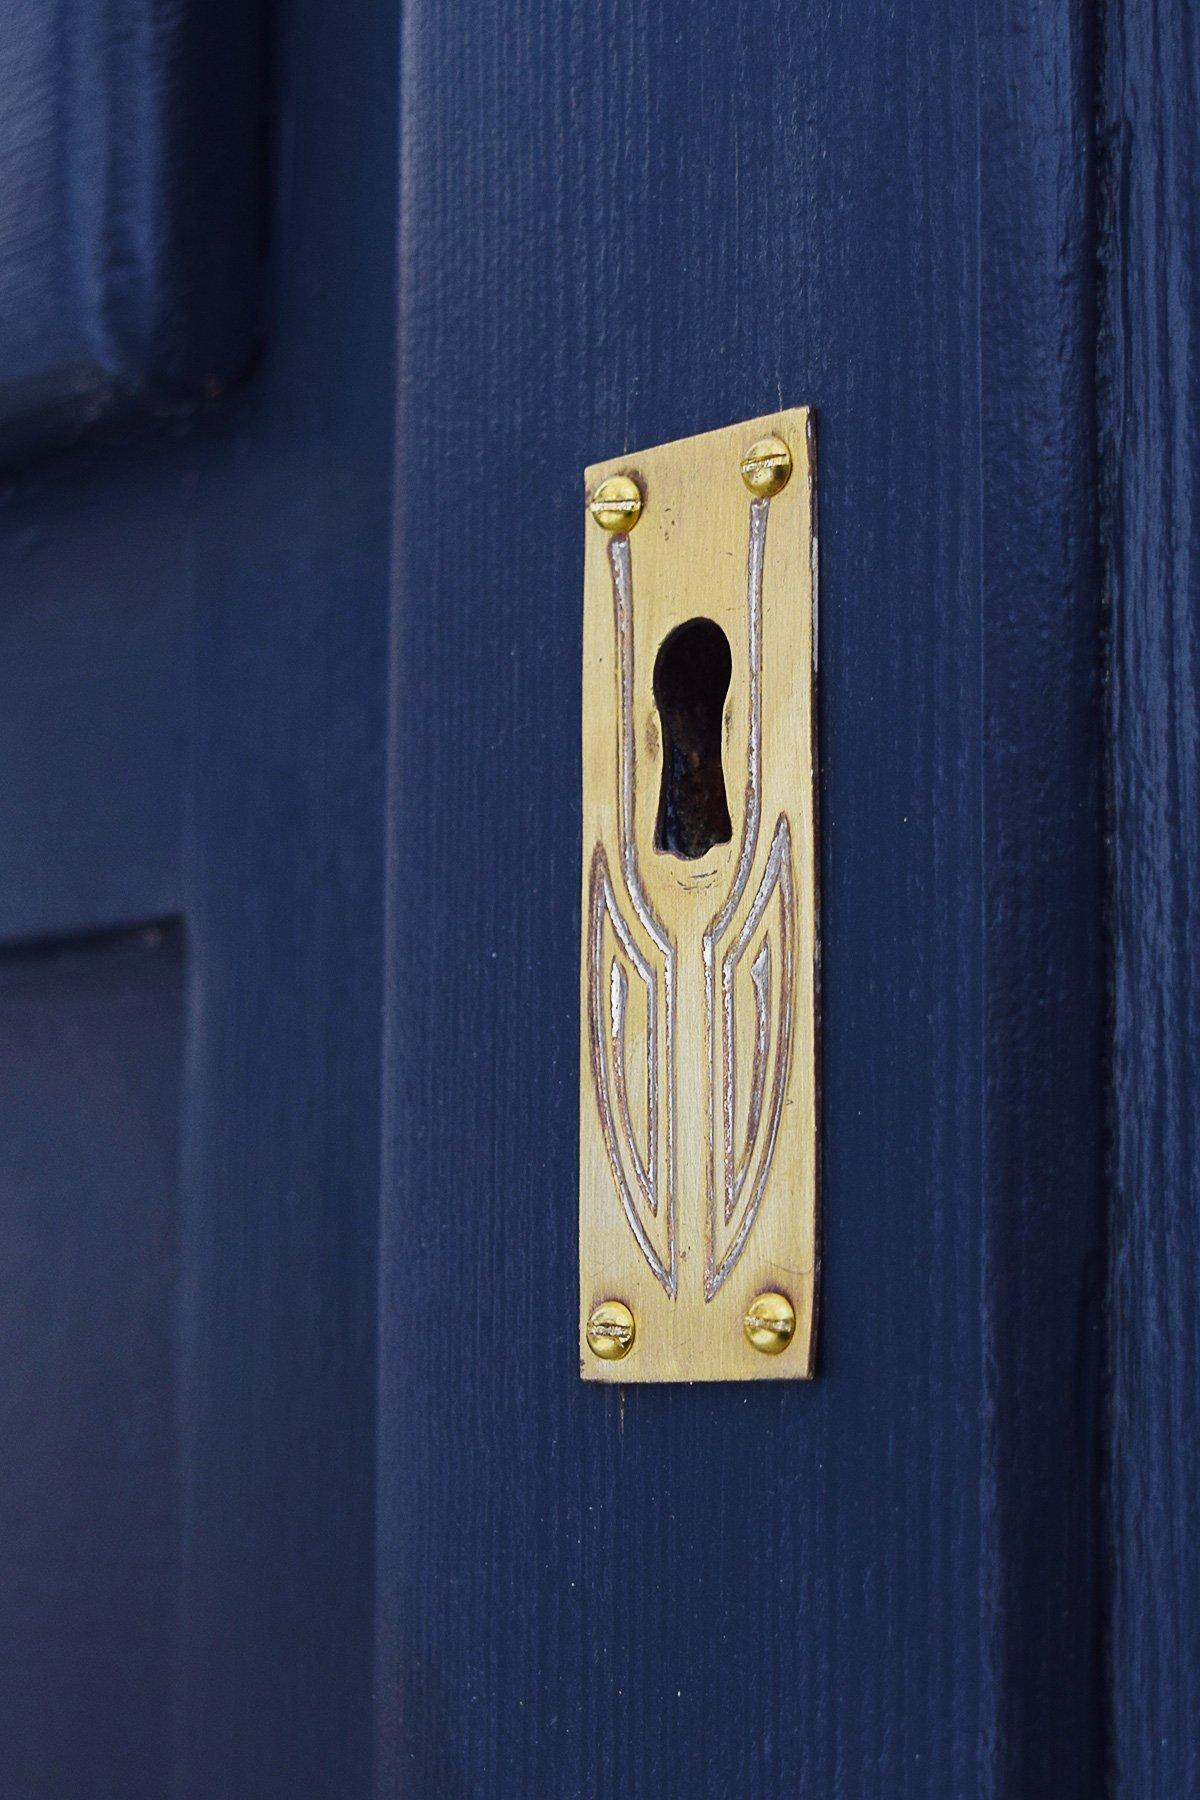 Antique Fridge - Brass Plate | Little House On The Corner